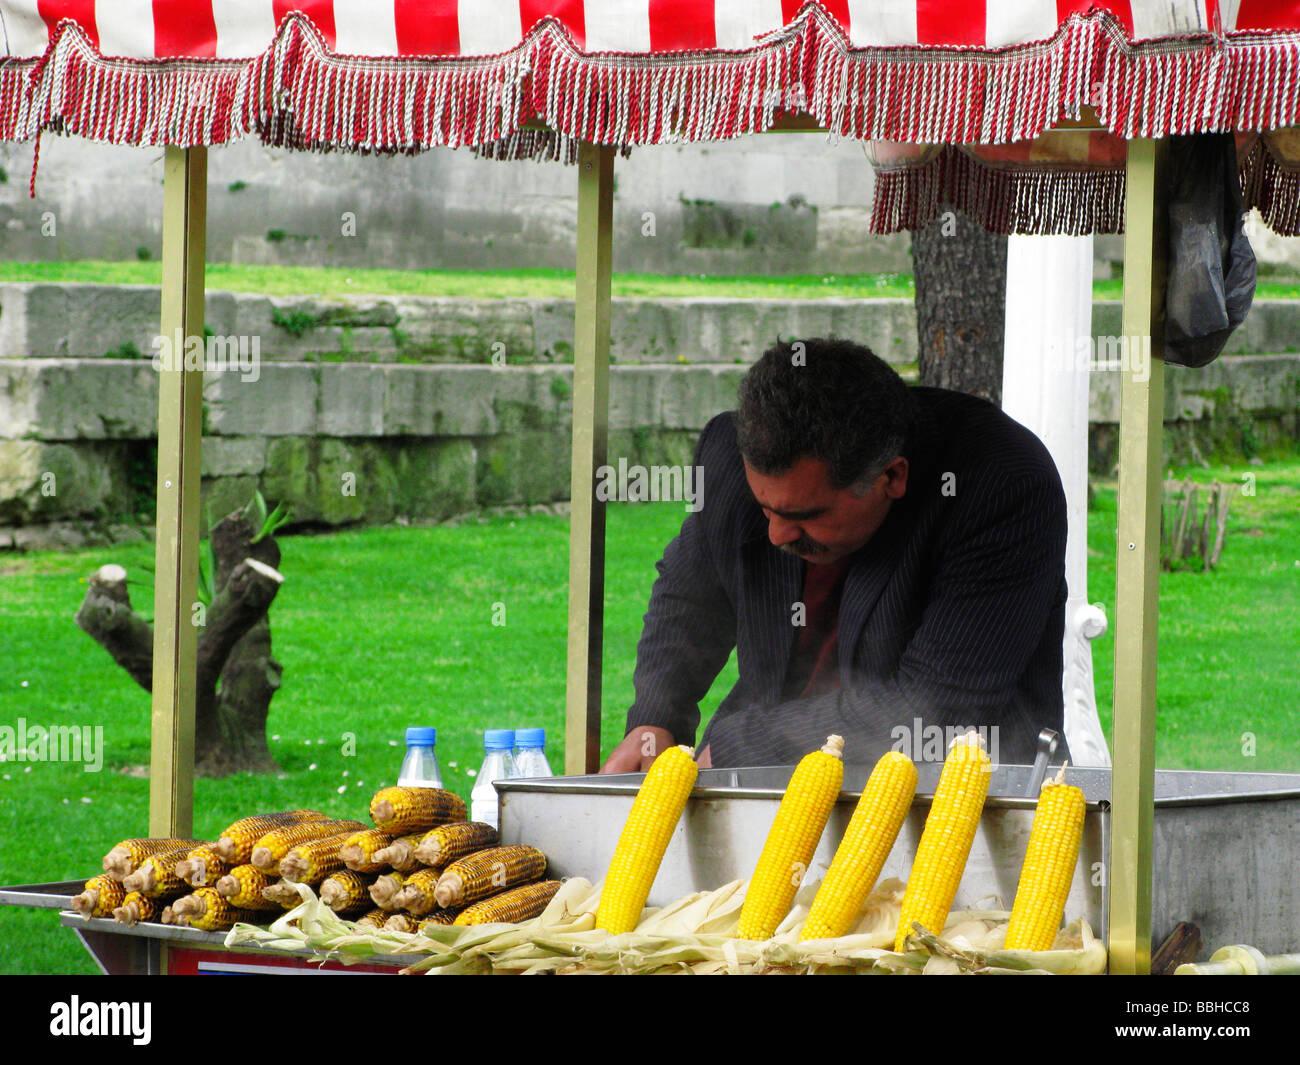 Street Vendor selling grilled Corn on the Cob Sultanahmet Istanbul Turkey - Stock Image